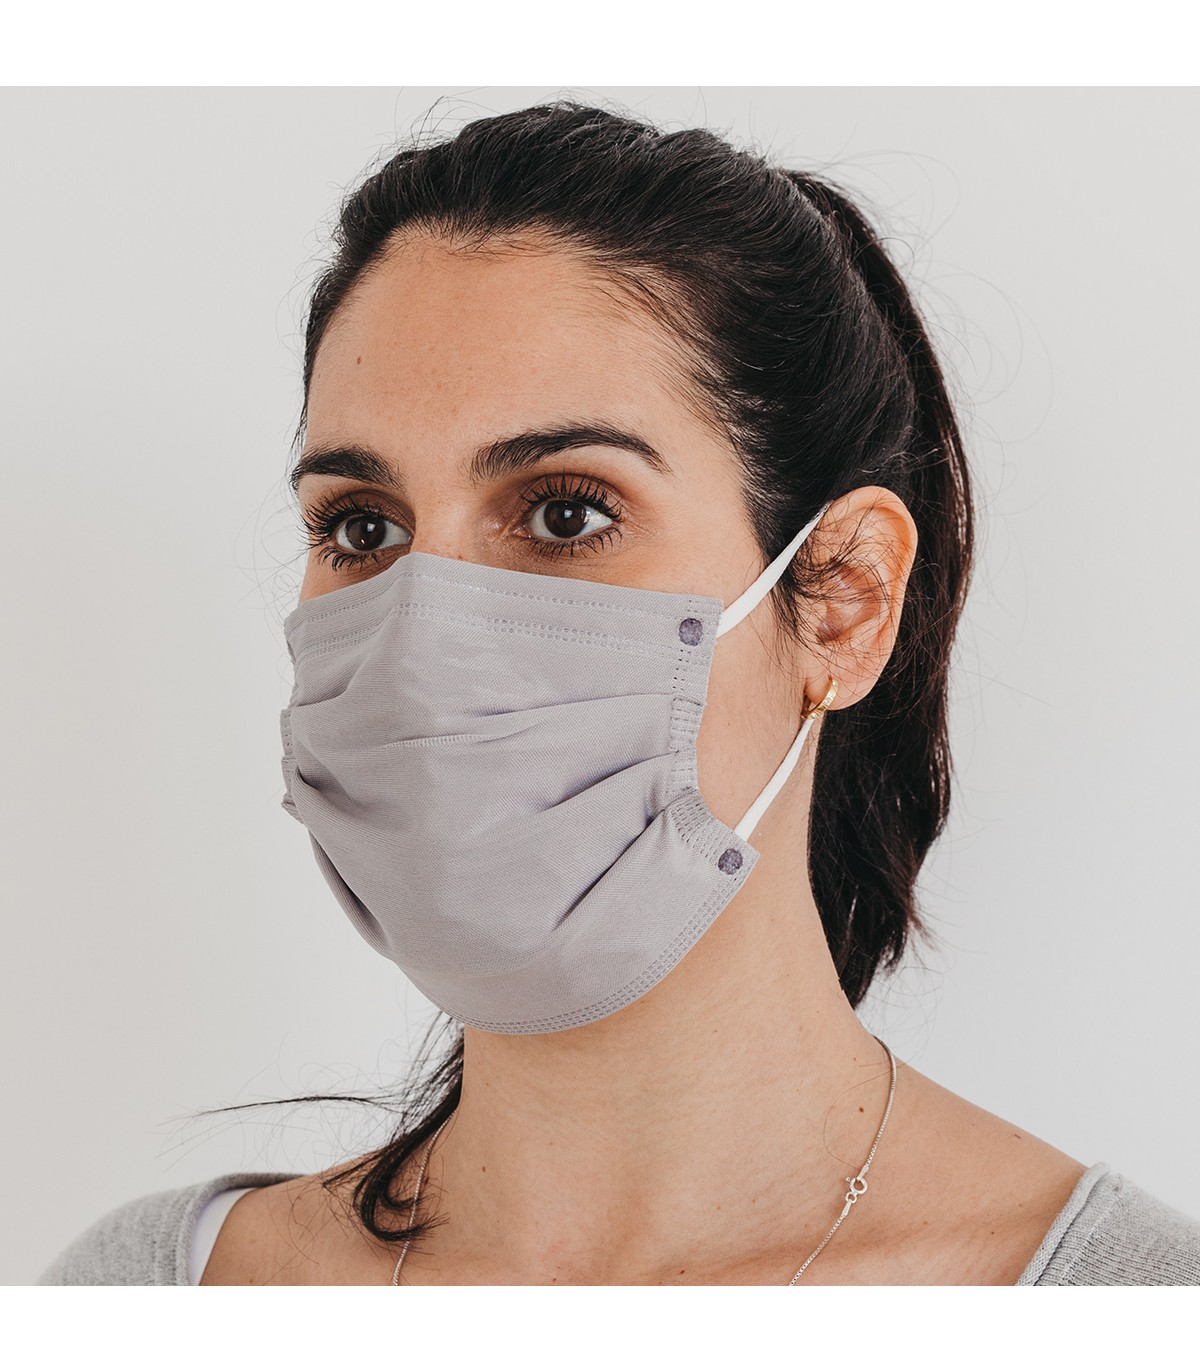 Mascarilla quirúrgica textil reutilizable - gris